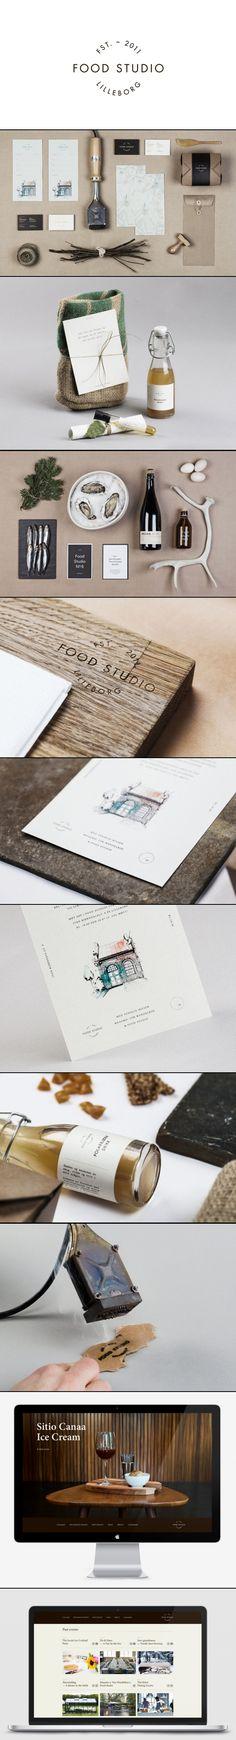 food studio Design agency Bielke+Yang // #BrandIdentity #GraphicDesign #PrintDesign #Inspiration